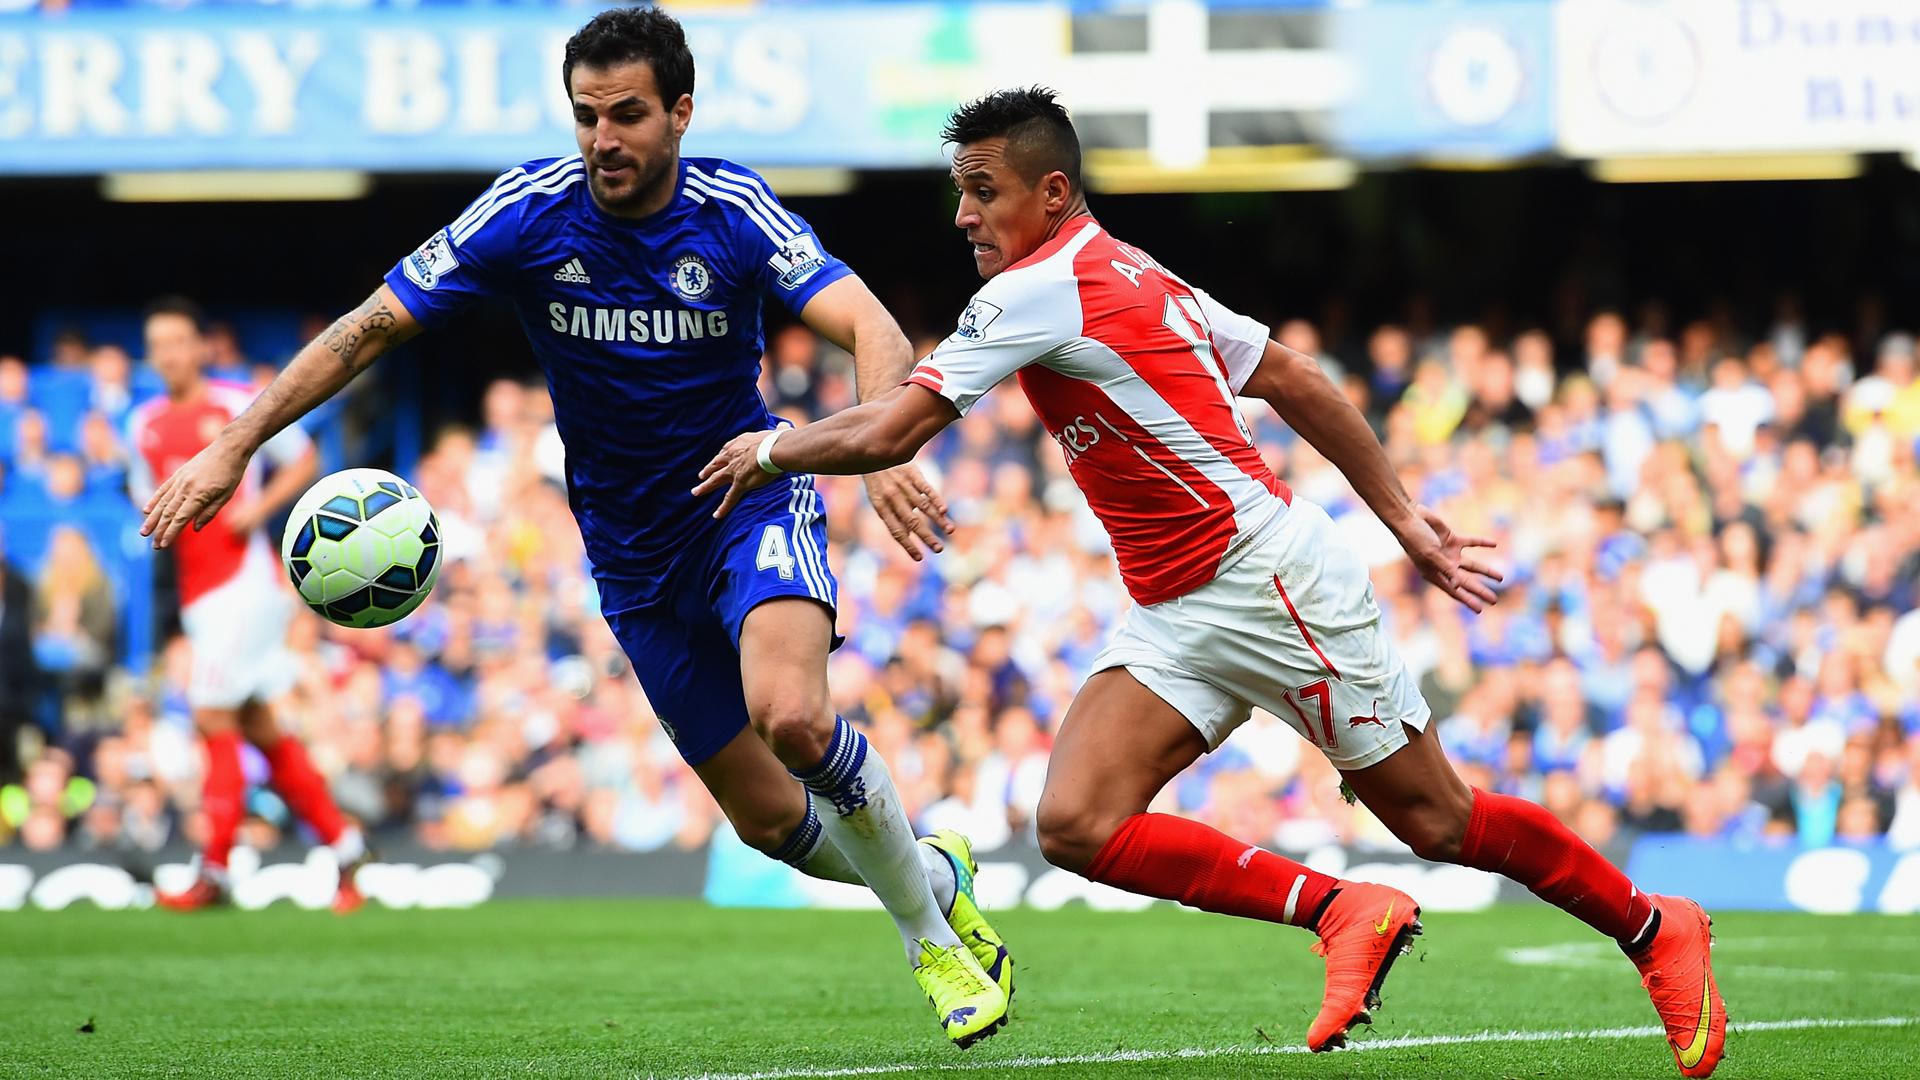 Arsenal vs. Chelsea – PREDICTION & PREVIEW